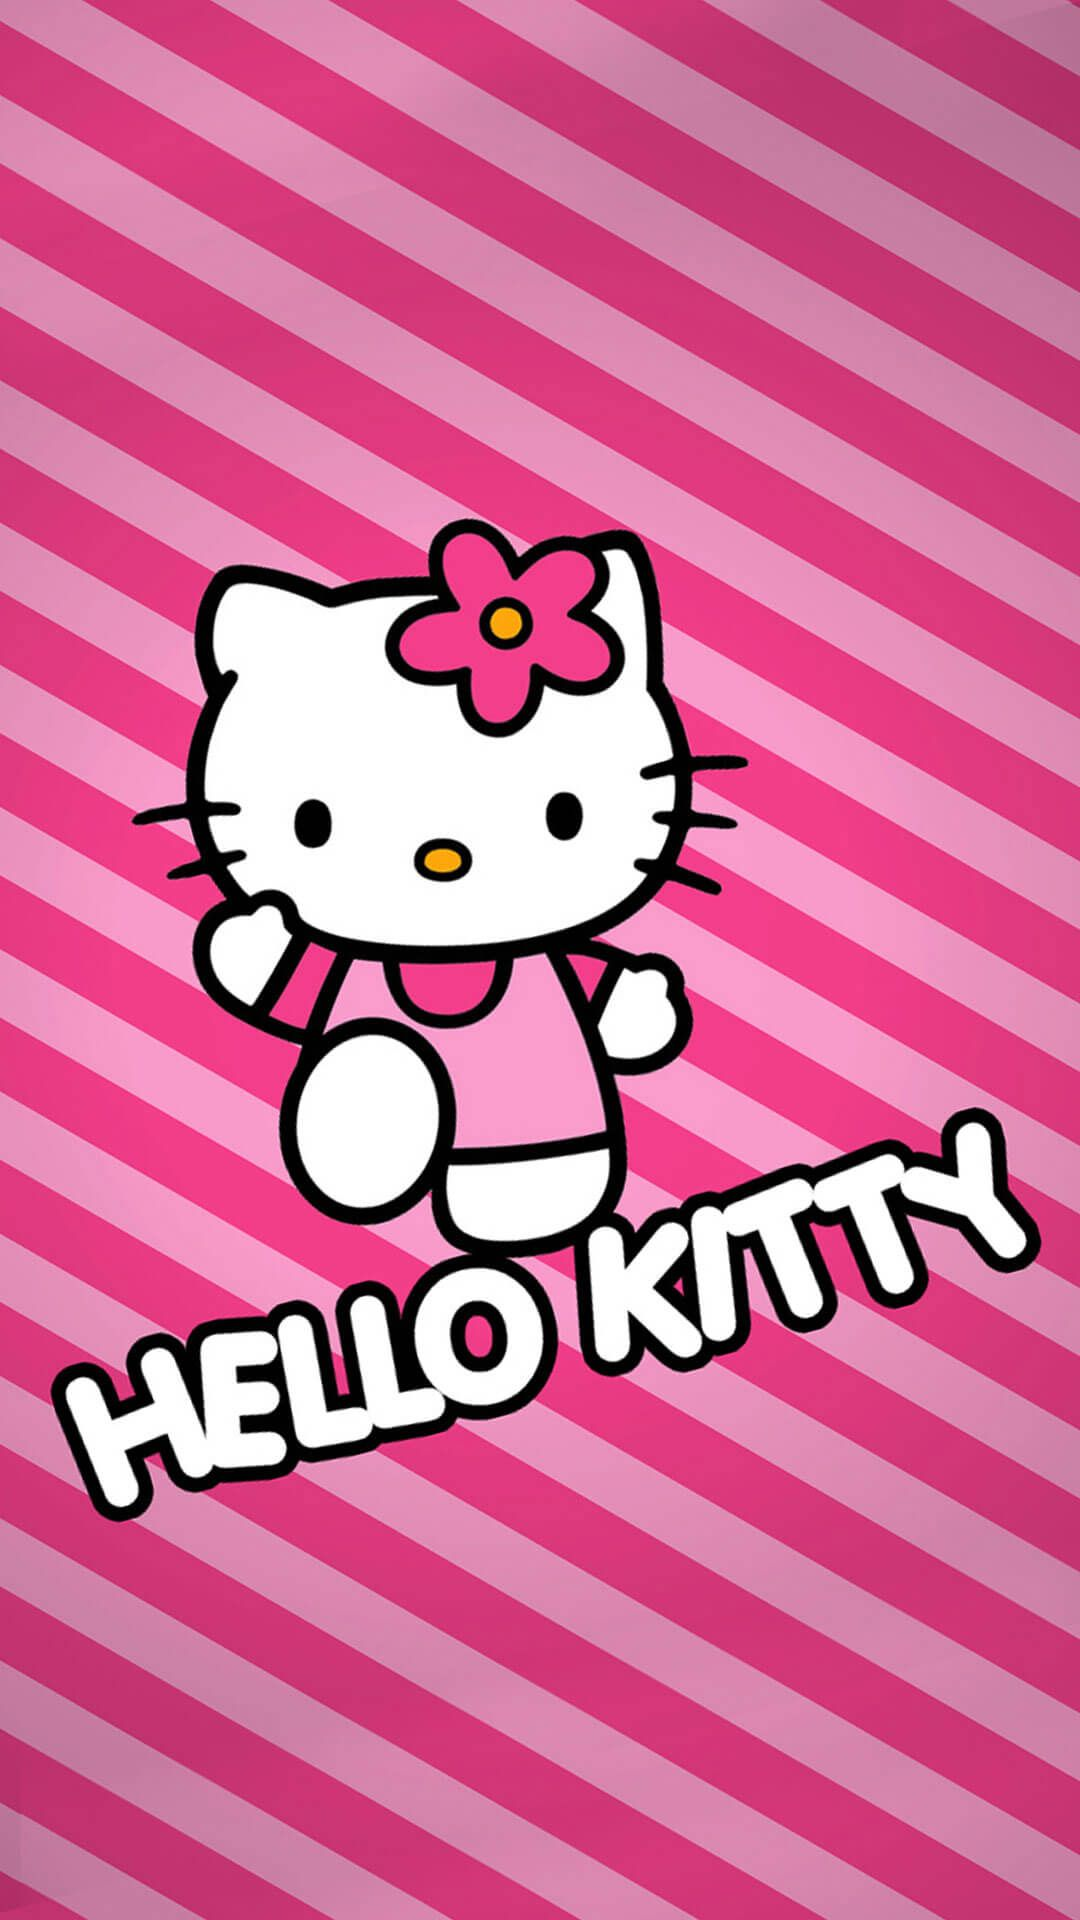 Download 78+ Gambar Vas Hello Kitty Terbaru Gratis